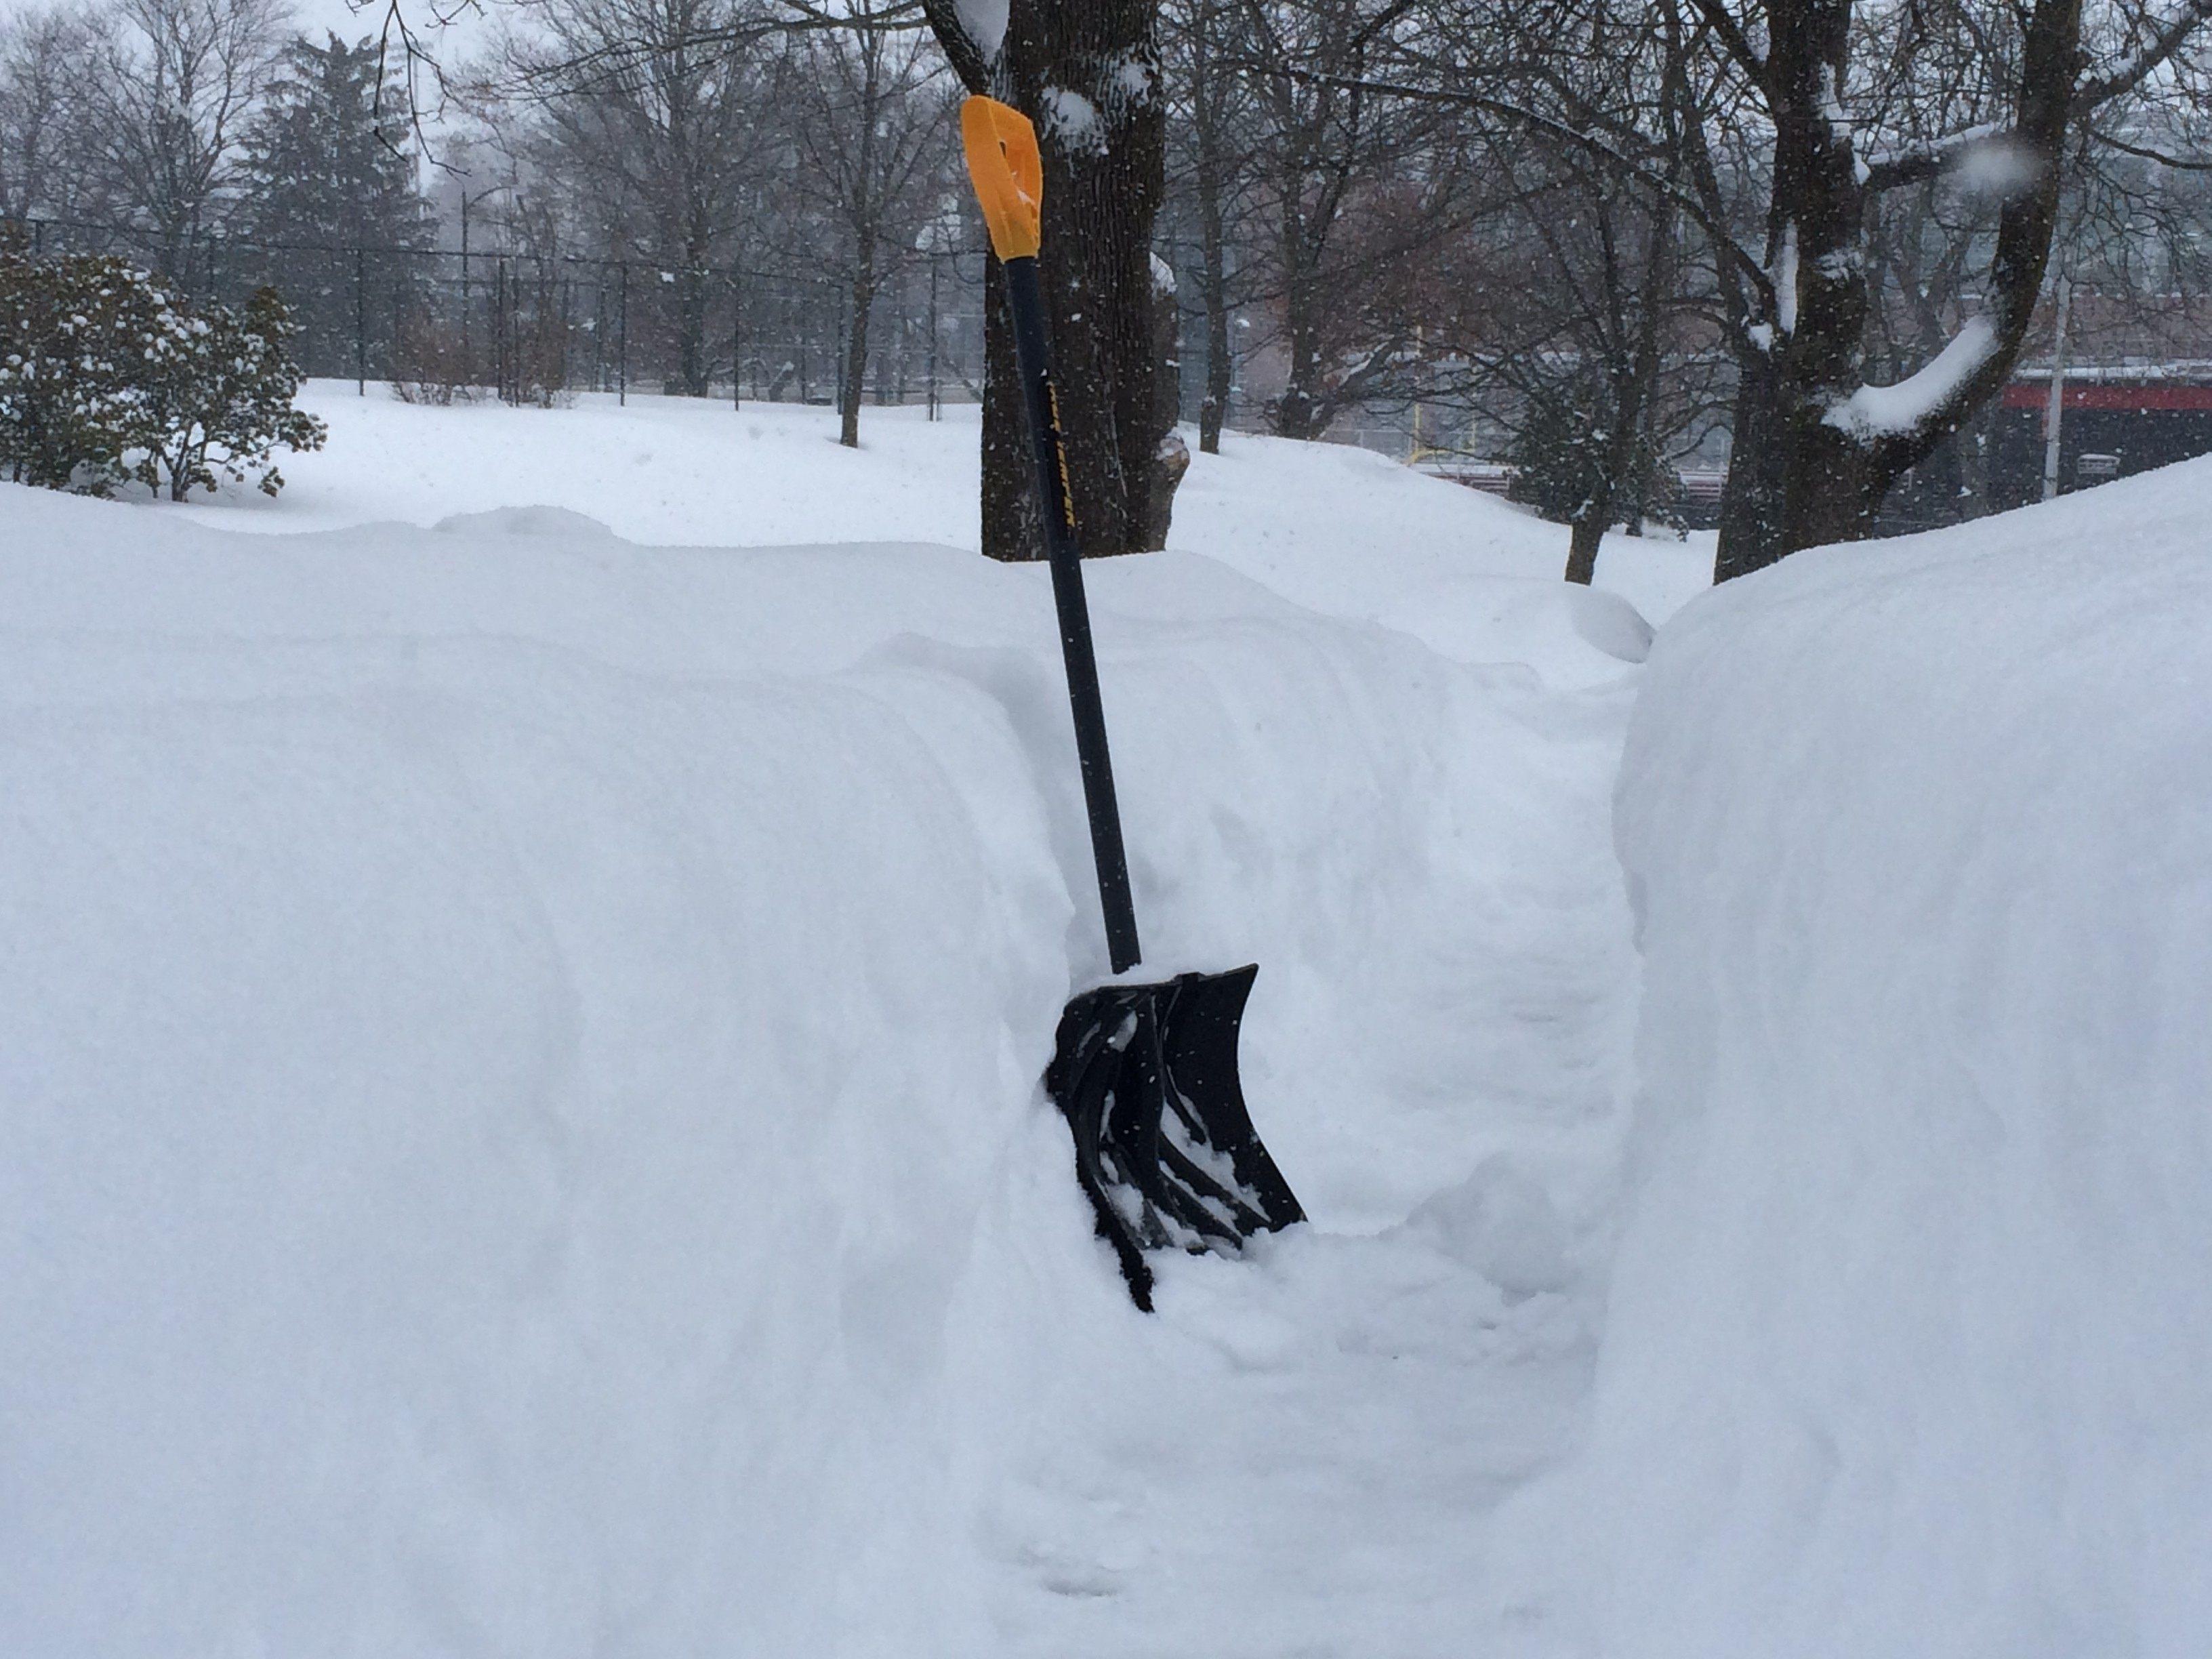 blizzard 15 shovel